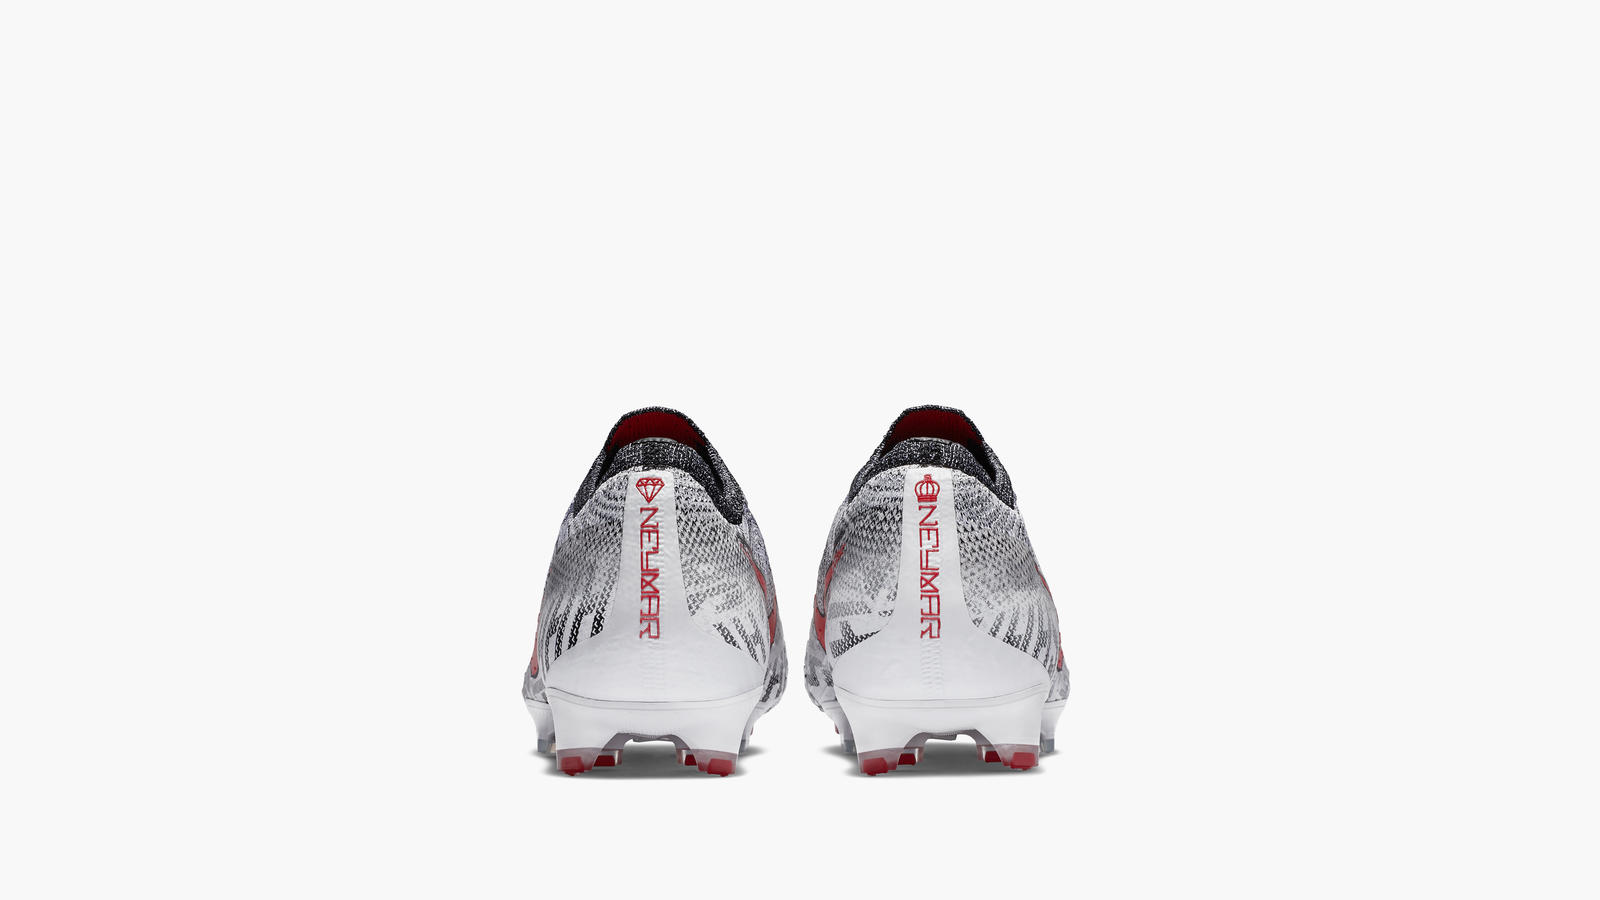 Nike Mercurial Vapor Neymar Silencio